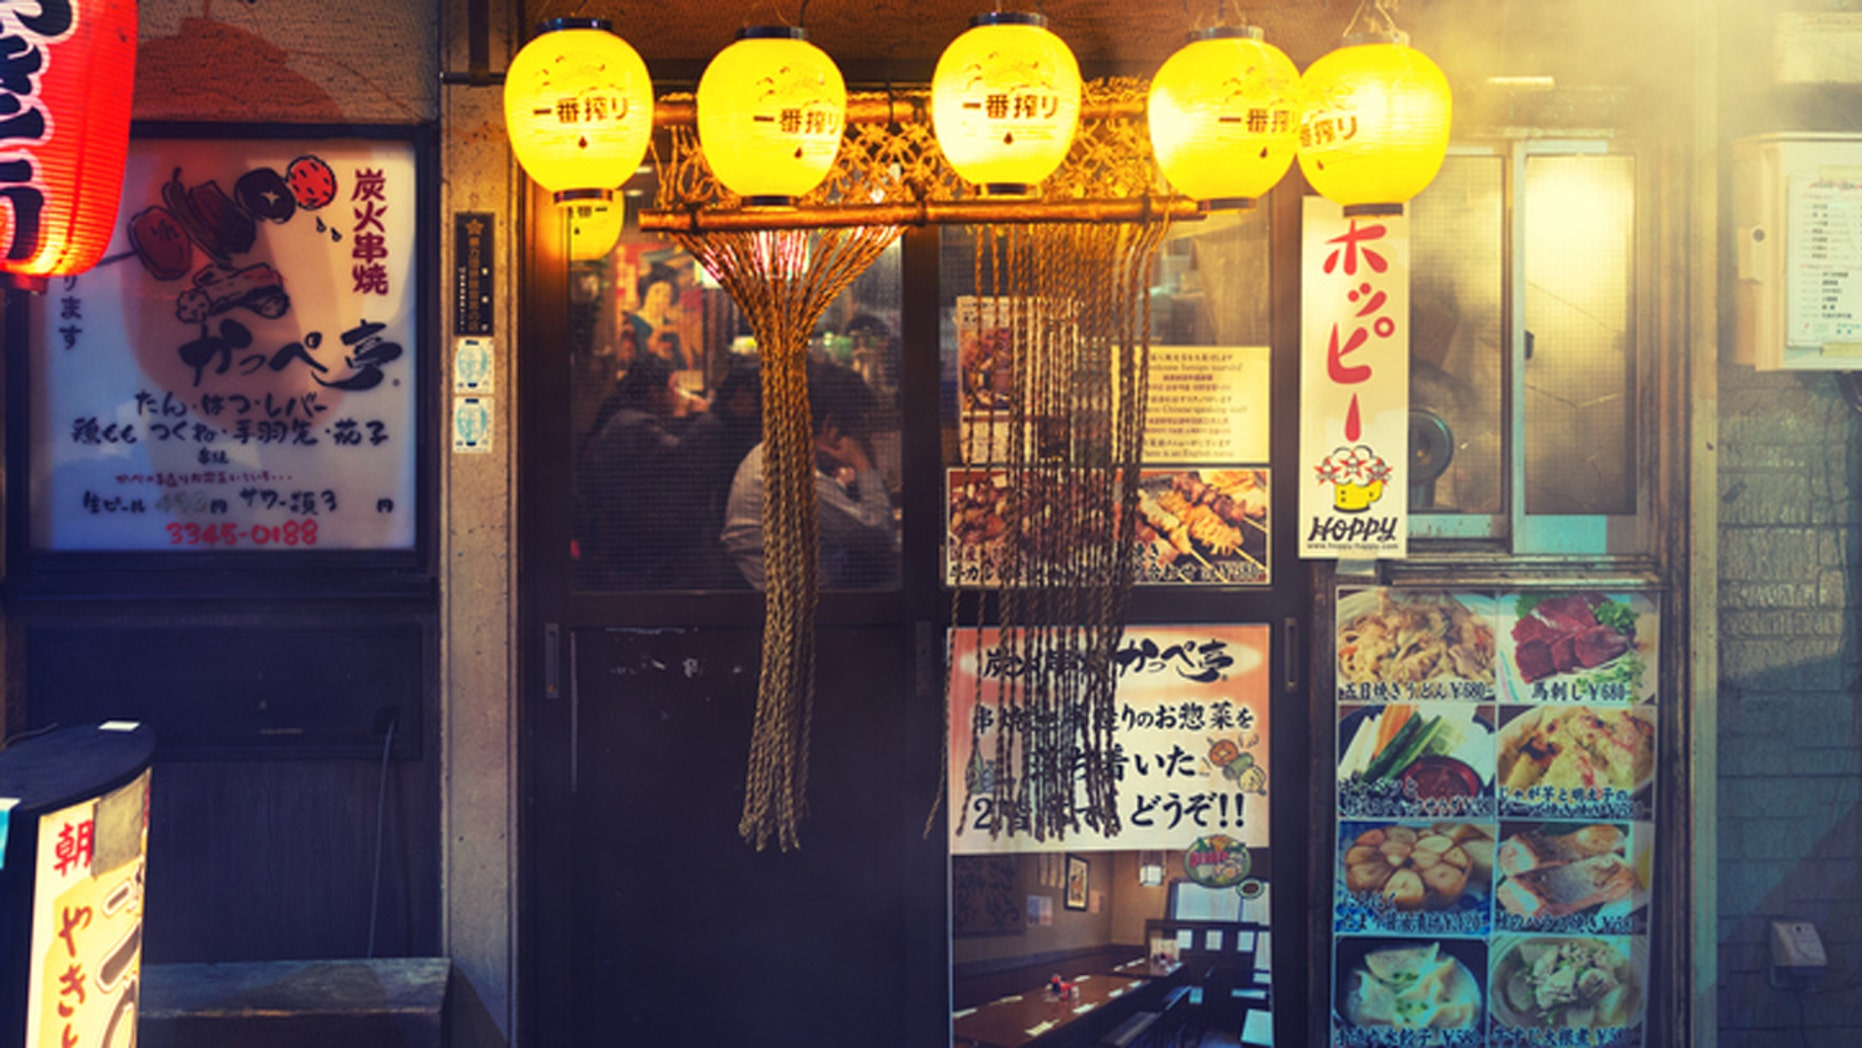 Tokyo, Japan - February 10, 2016: People are having dinner at a Japanese resturant (izakaya)